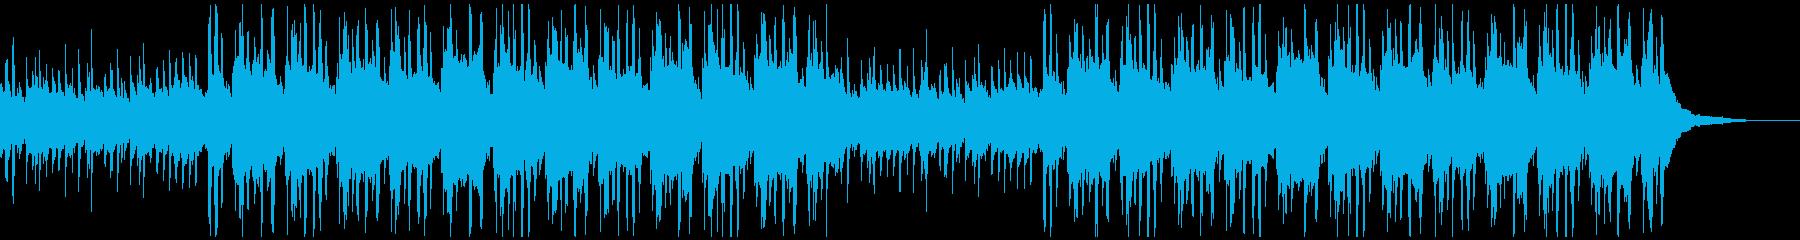 Japanese Chillhop 1の再生済みの波形